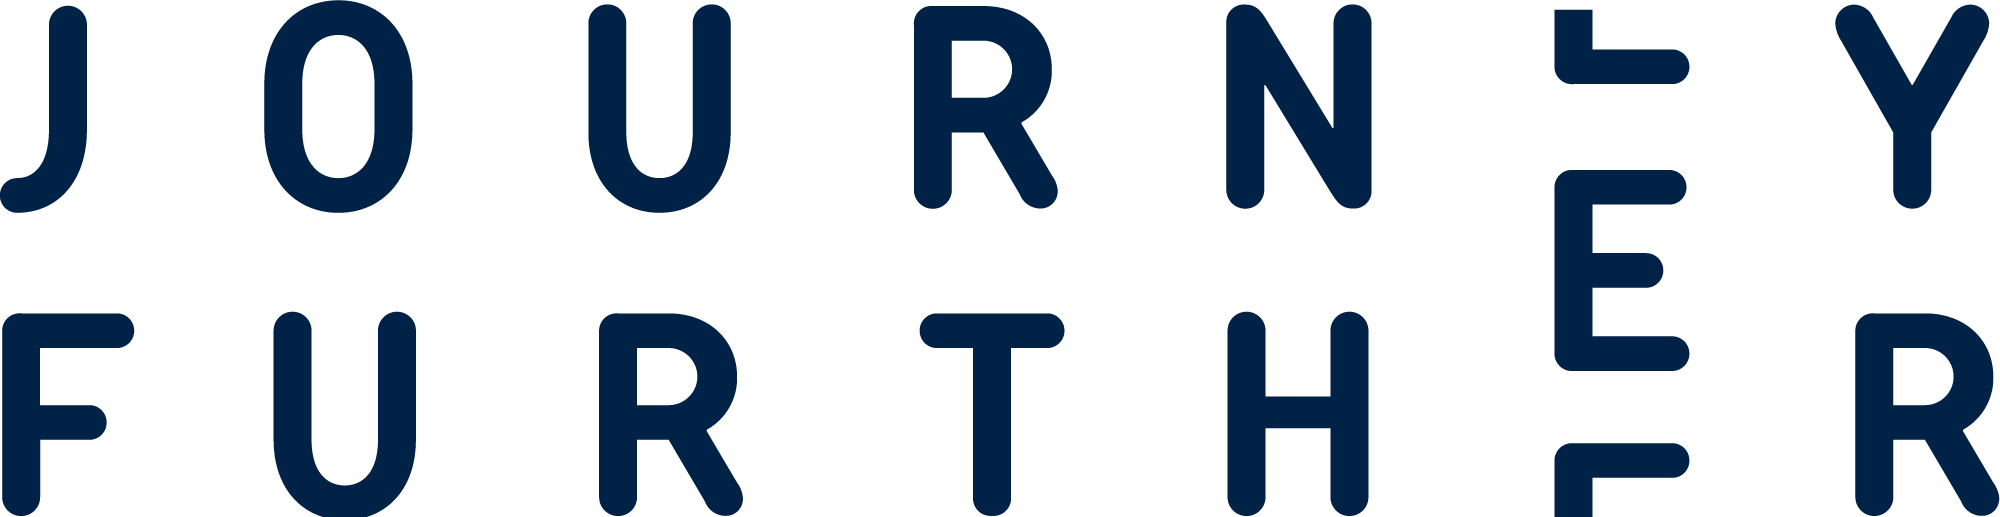 Journey Further logo